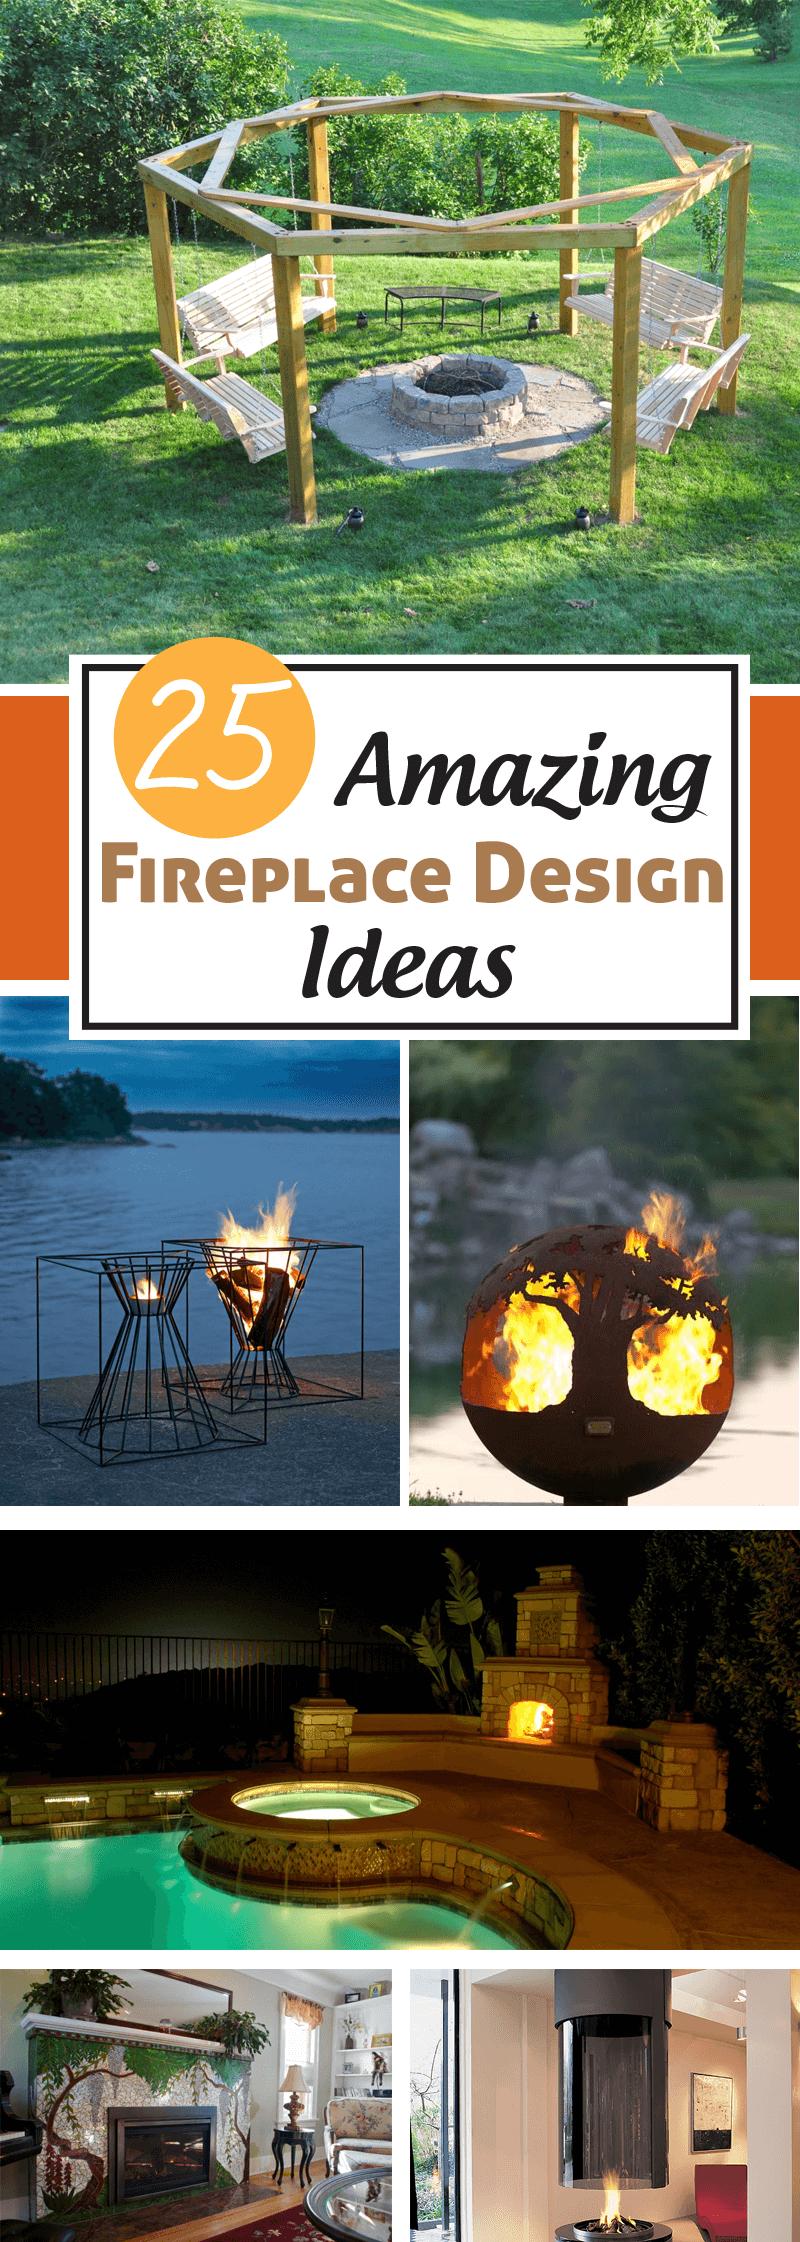 amazing fireplace design ideas